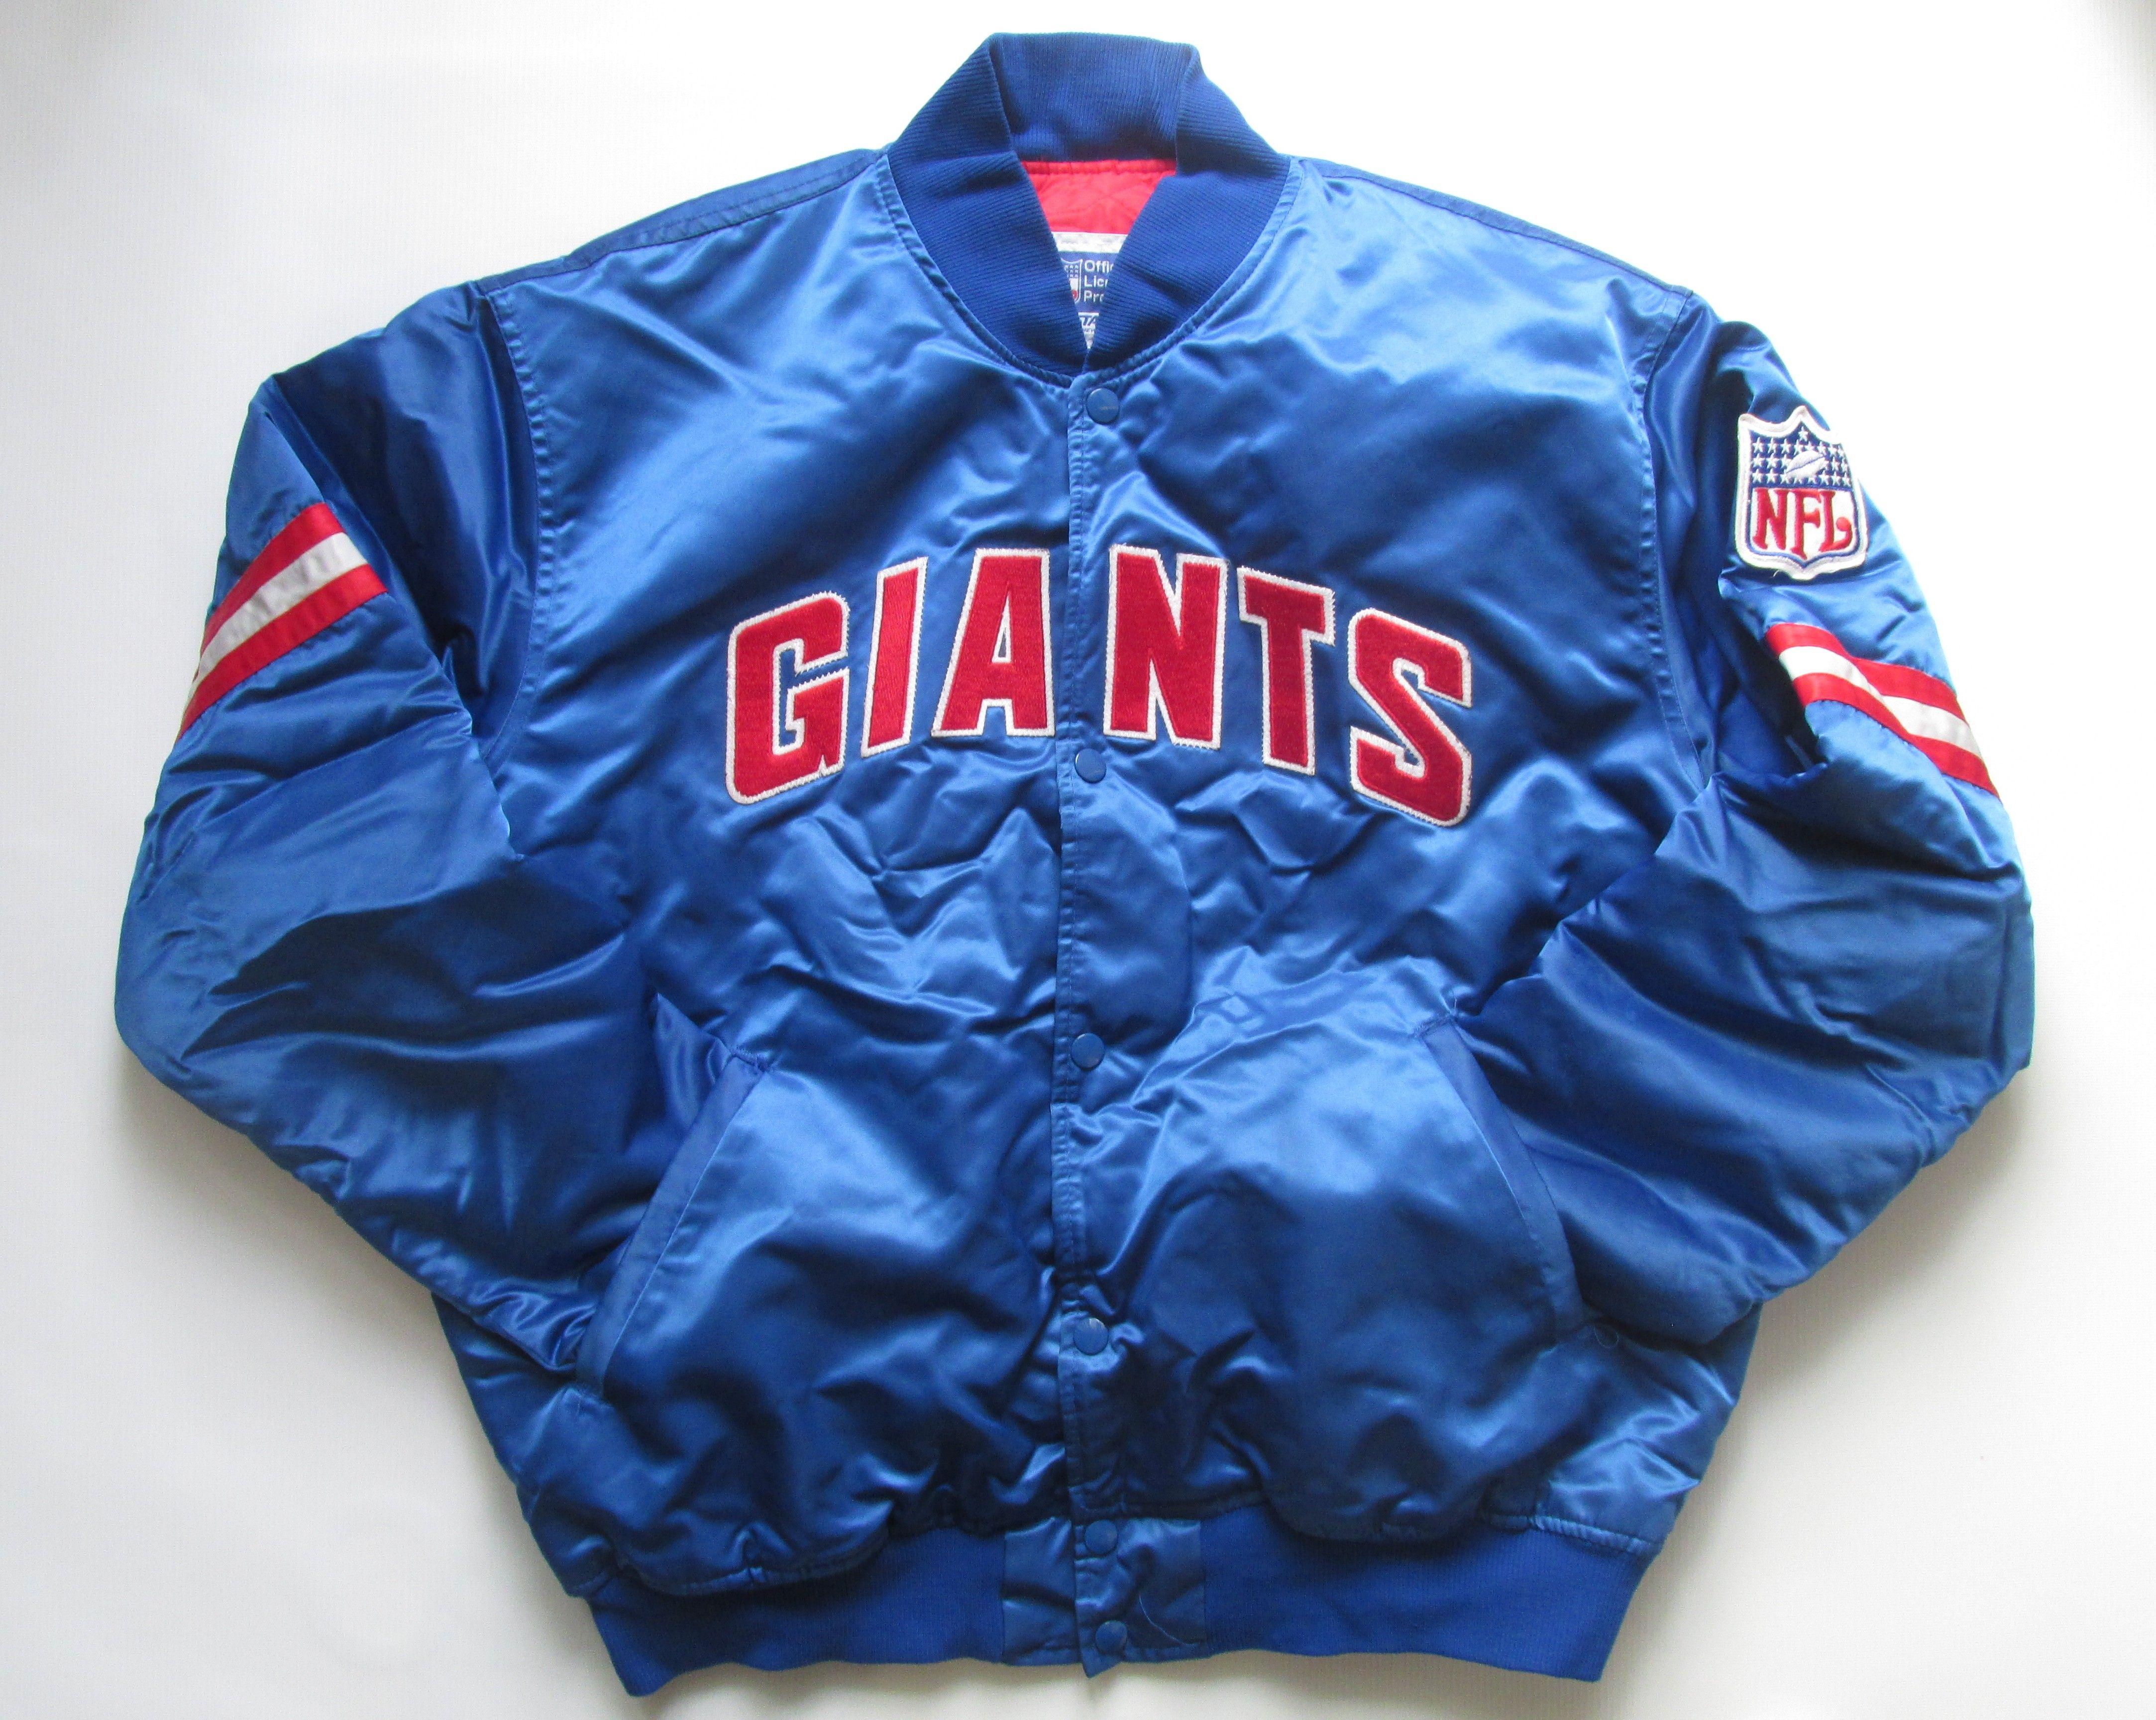 cc8b397f New York Giants 80s 90s NFL top jacket by Starter vintage vtg retro NYG USA  #